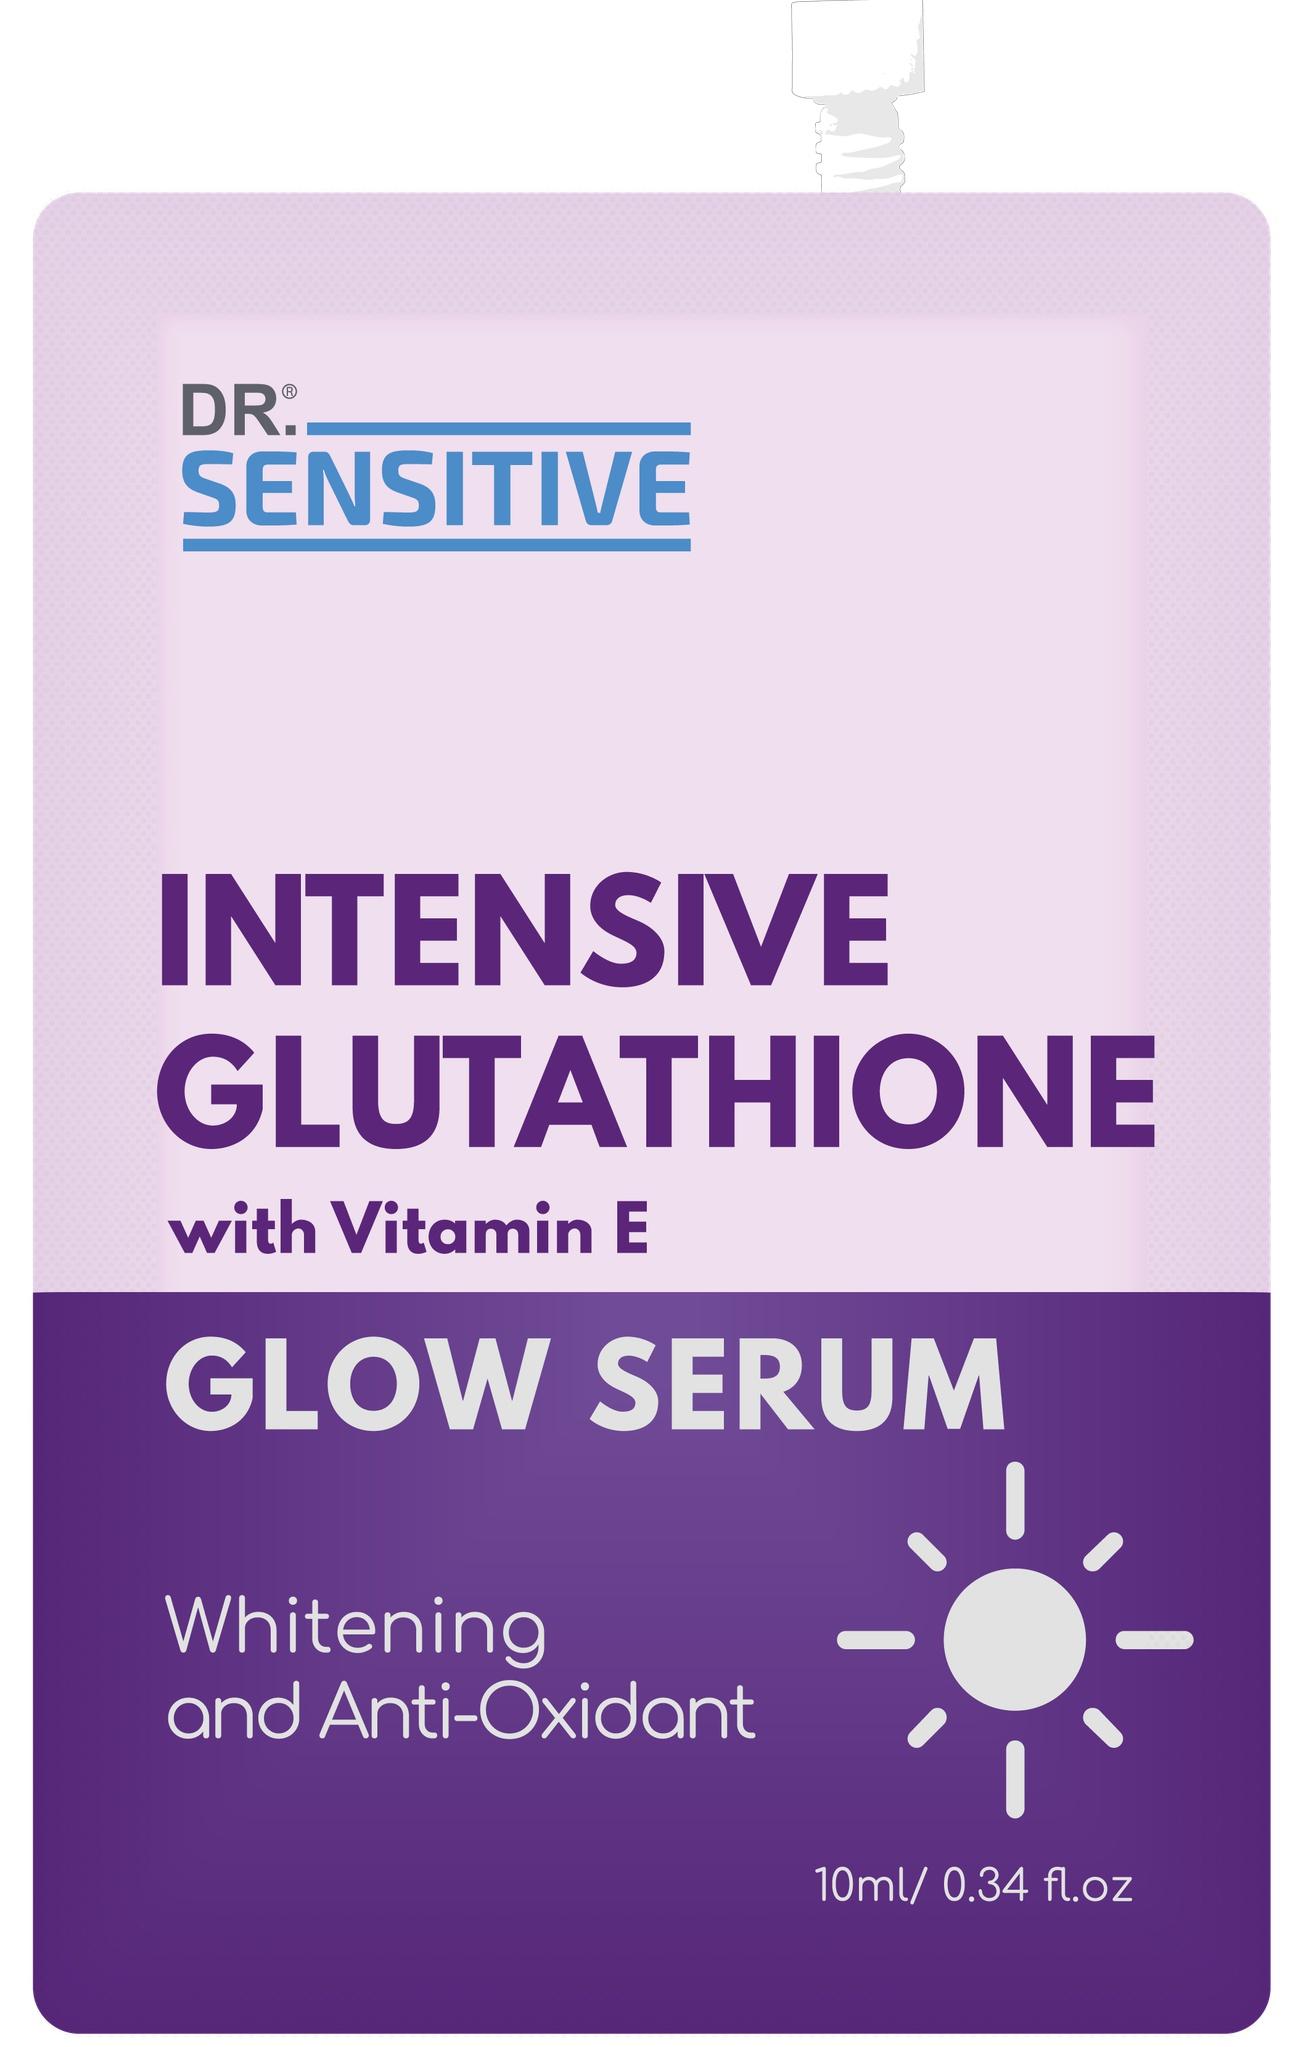 Dr. Sensitive Intensive Glutathione Glow Serum